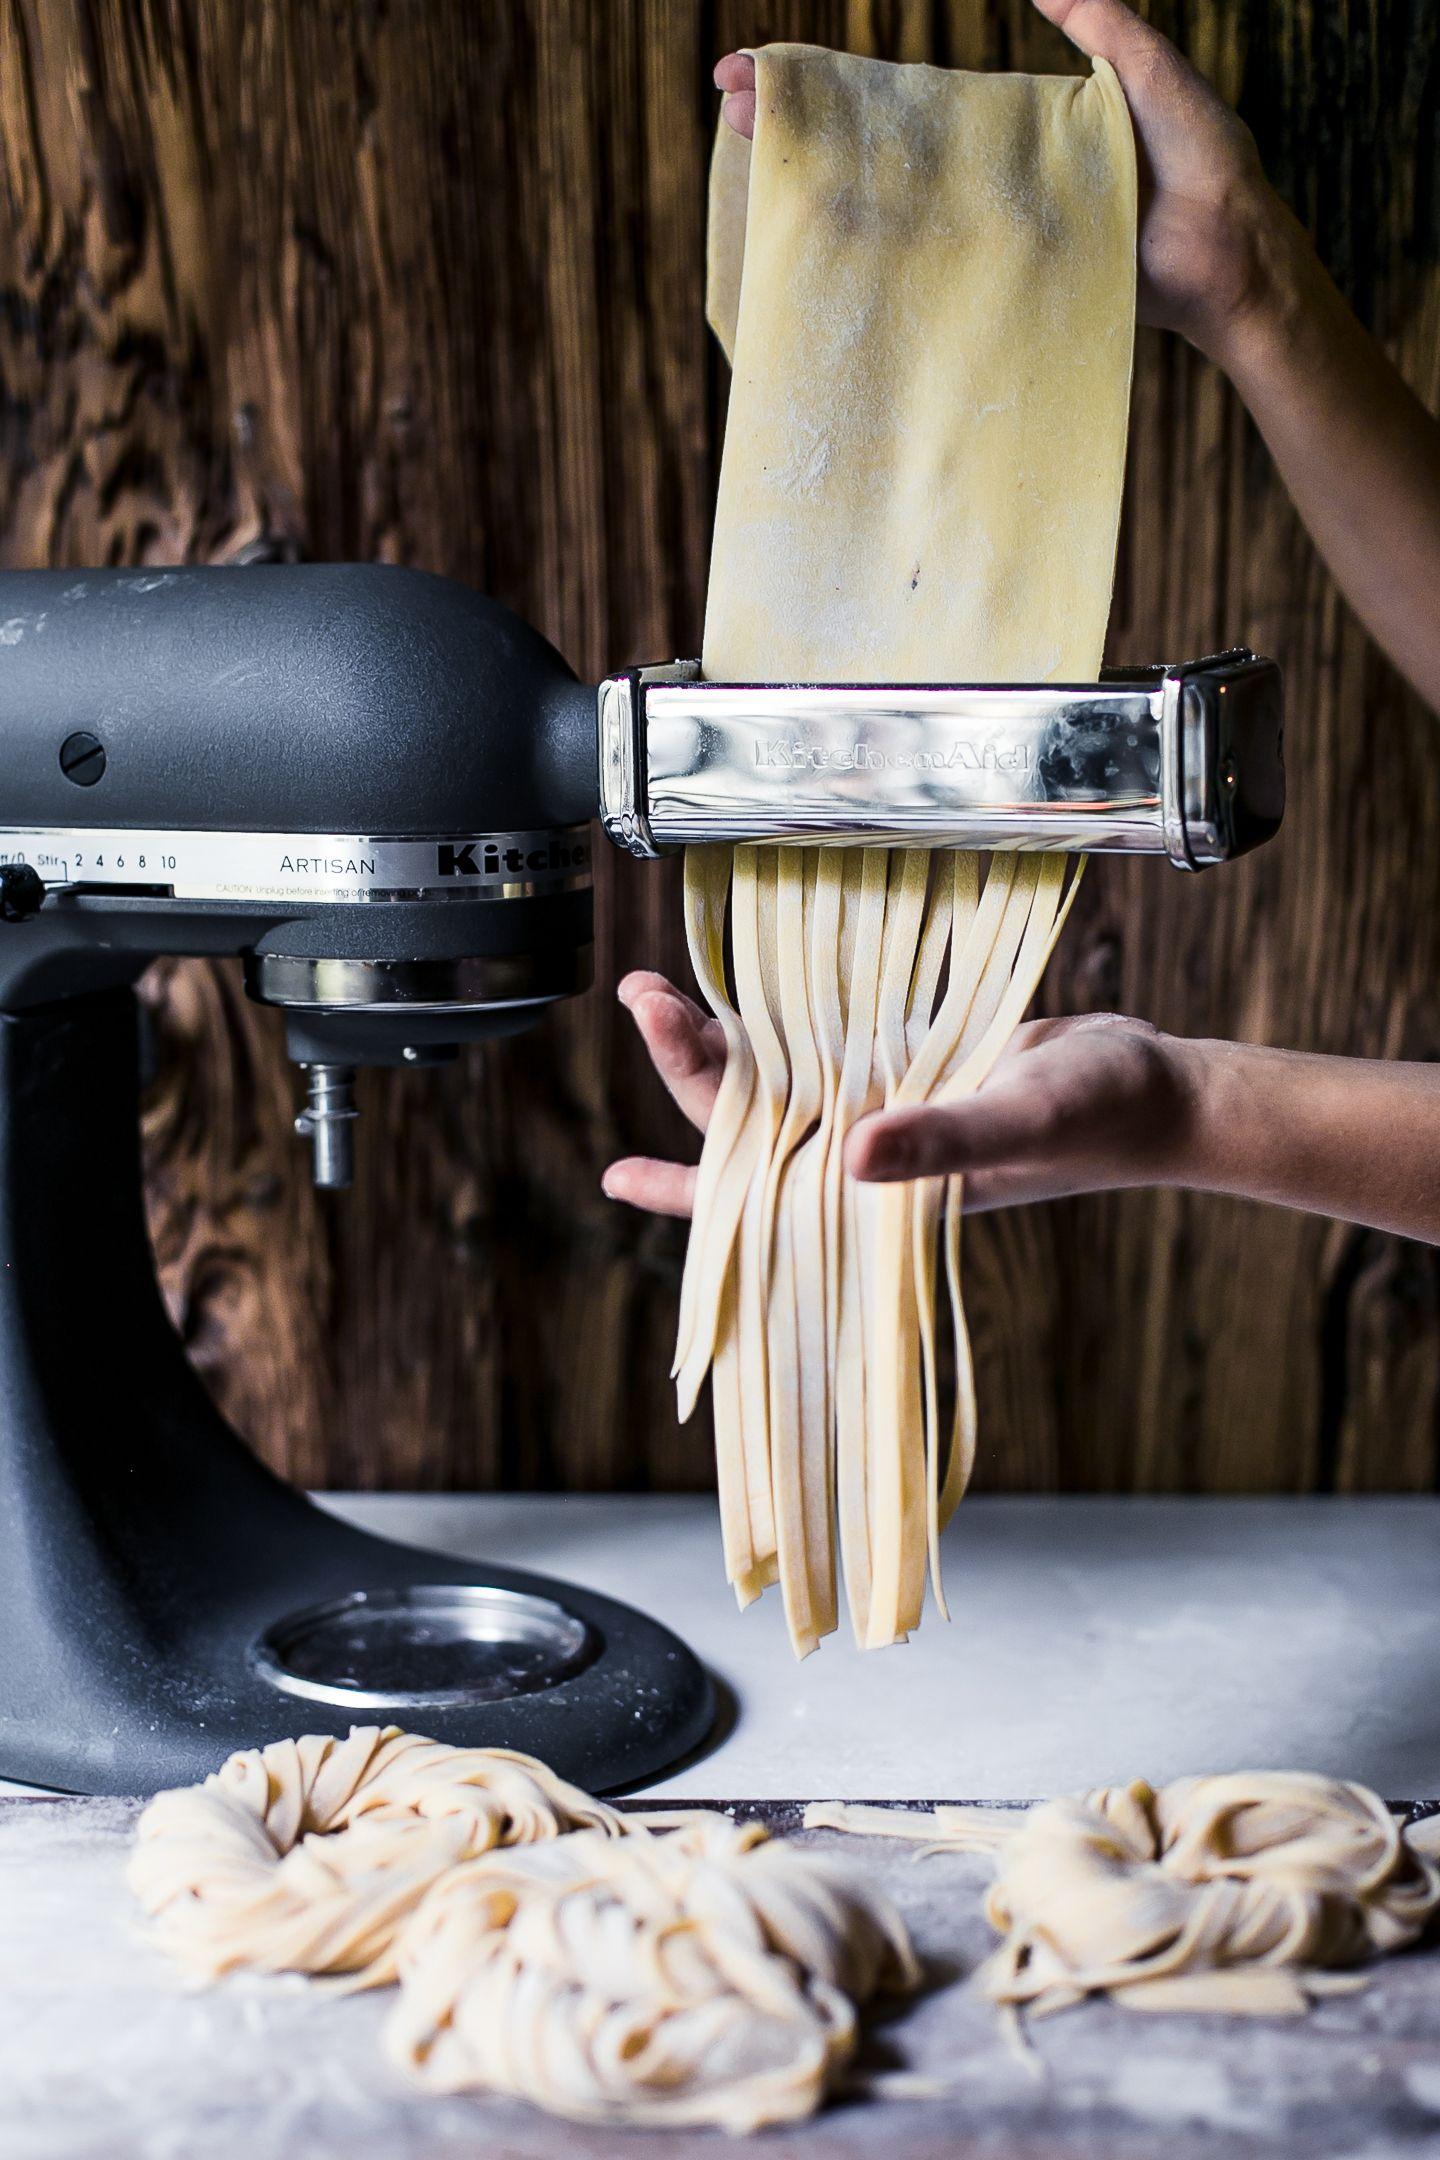 Kitchenaid Stand Mixer Pasta Attachment Set Kitchenaid Pasta Maker Pasta Maker Kitchen Aid Pasta Attachment